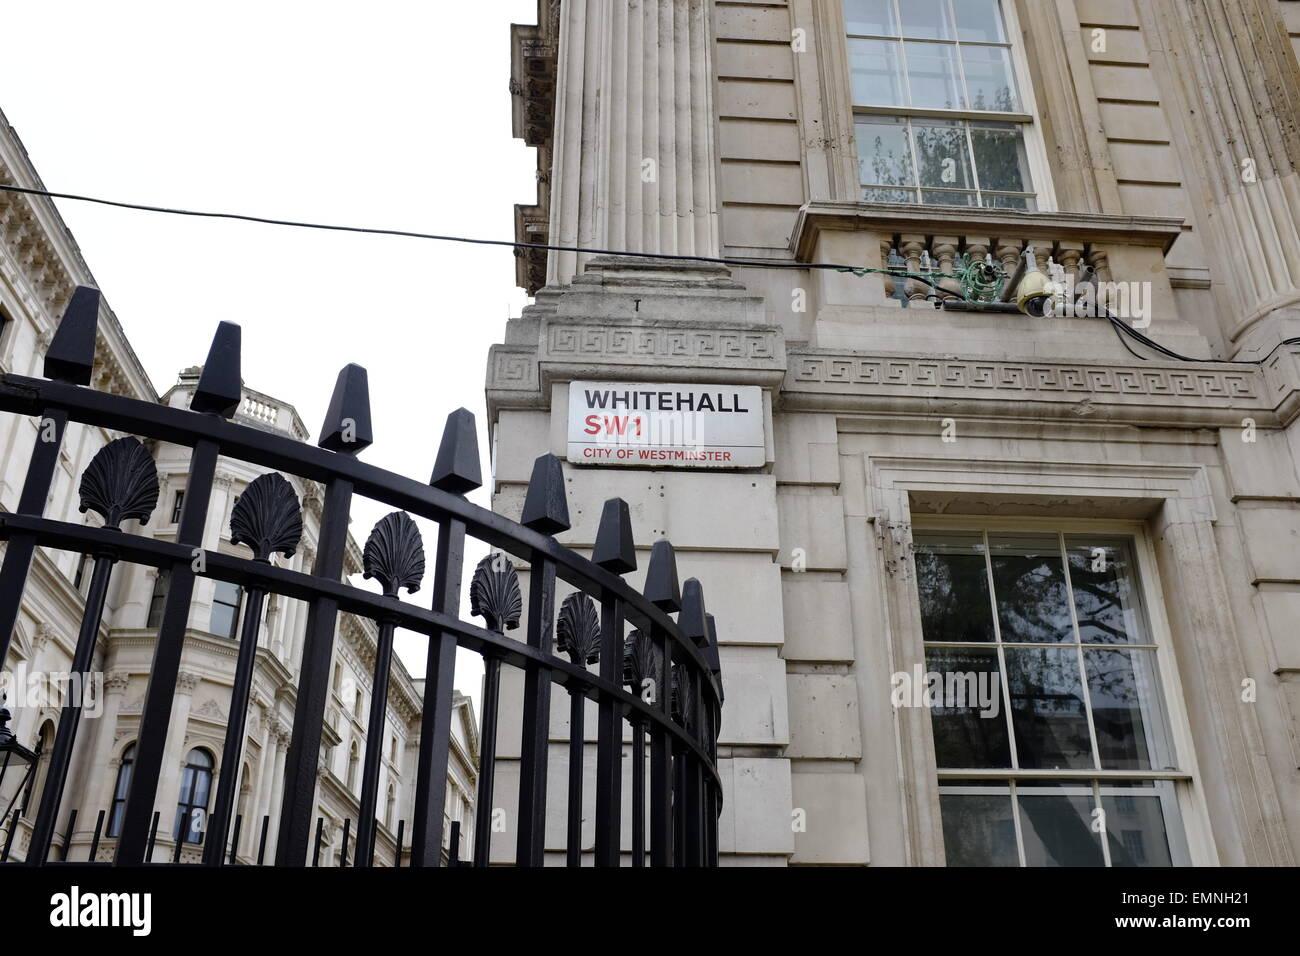 Whitehall Street Sign, Westminster, London, England, UK - Stock Image